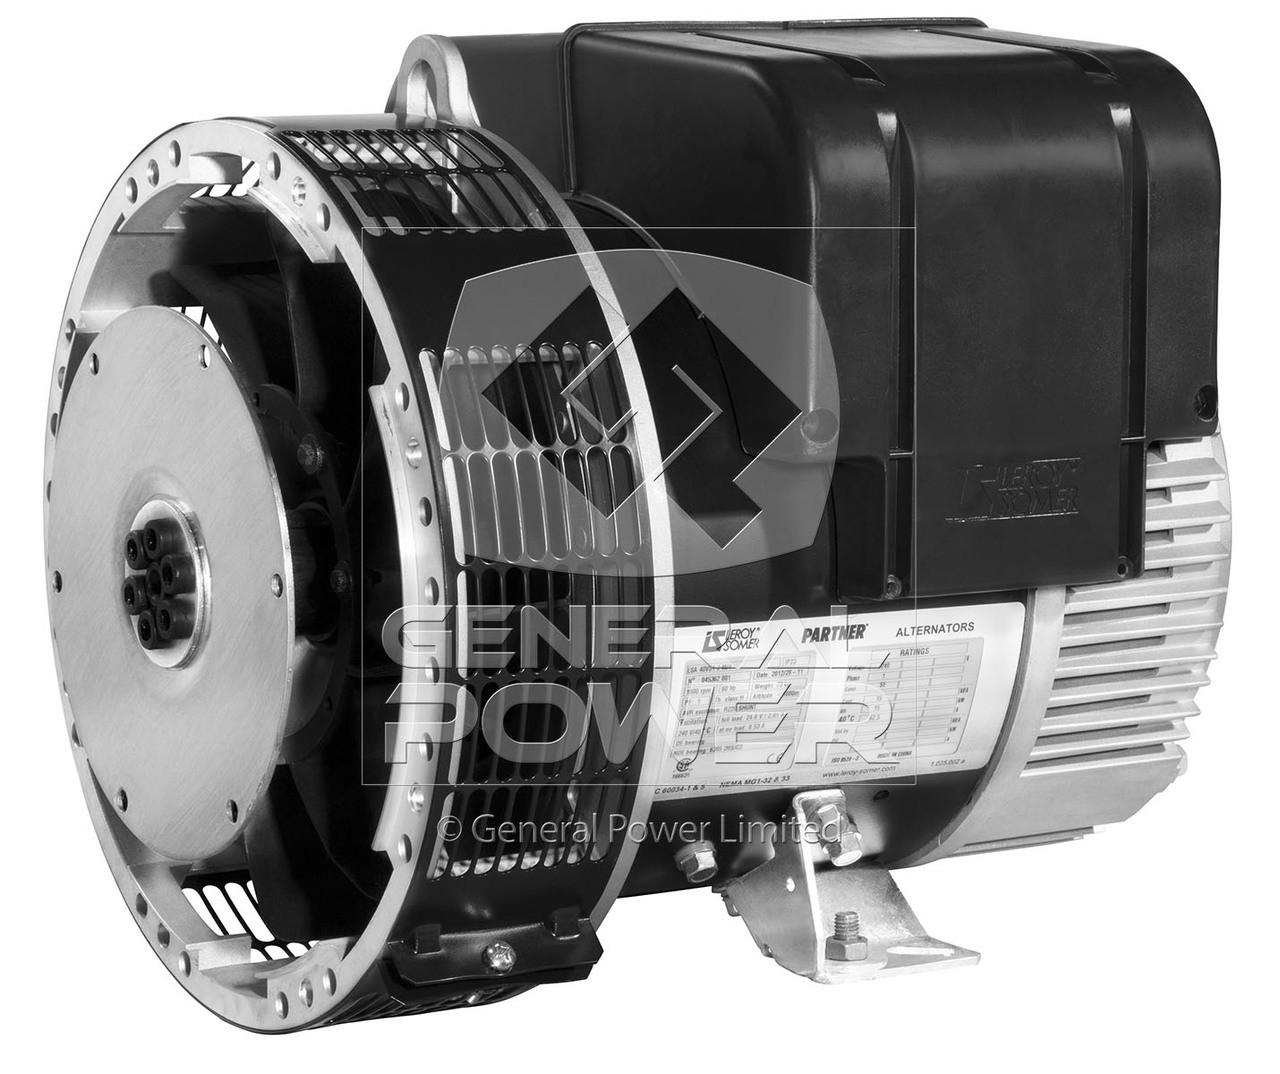 Leroy Somer LSA 423 M7 Alternator   Leroy Somer Generator